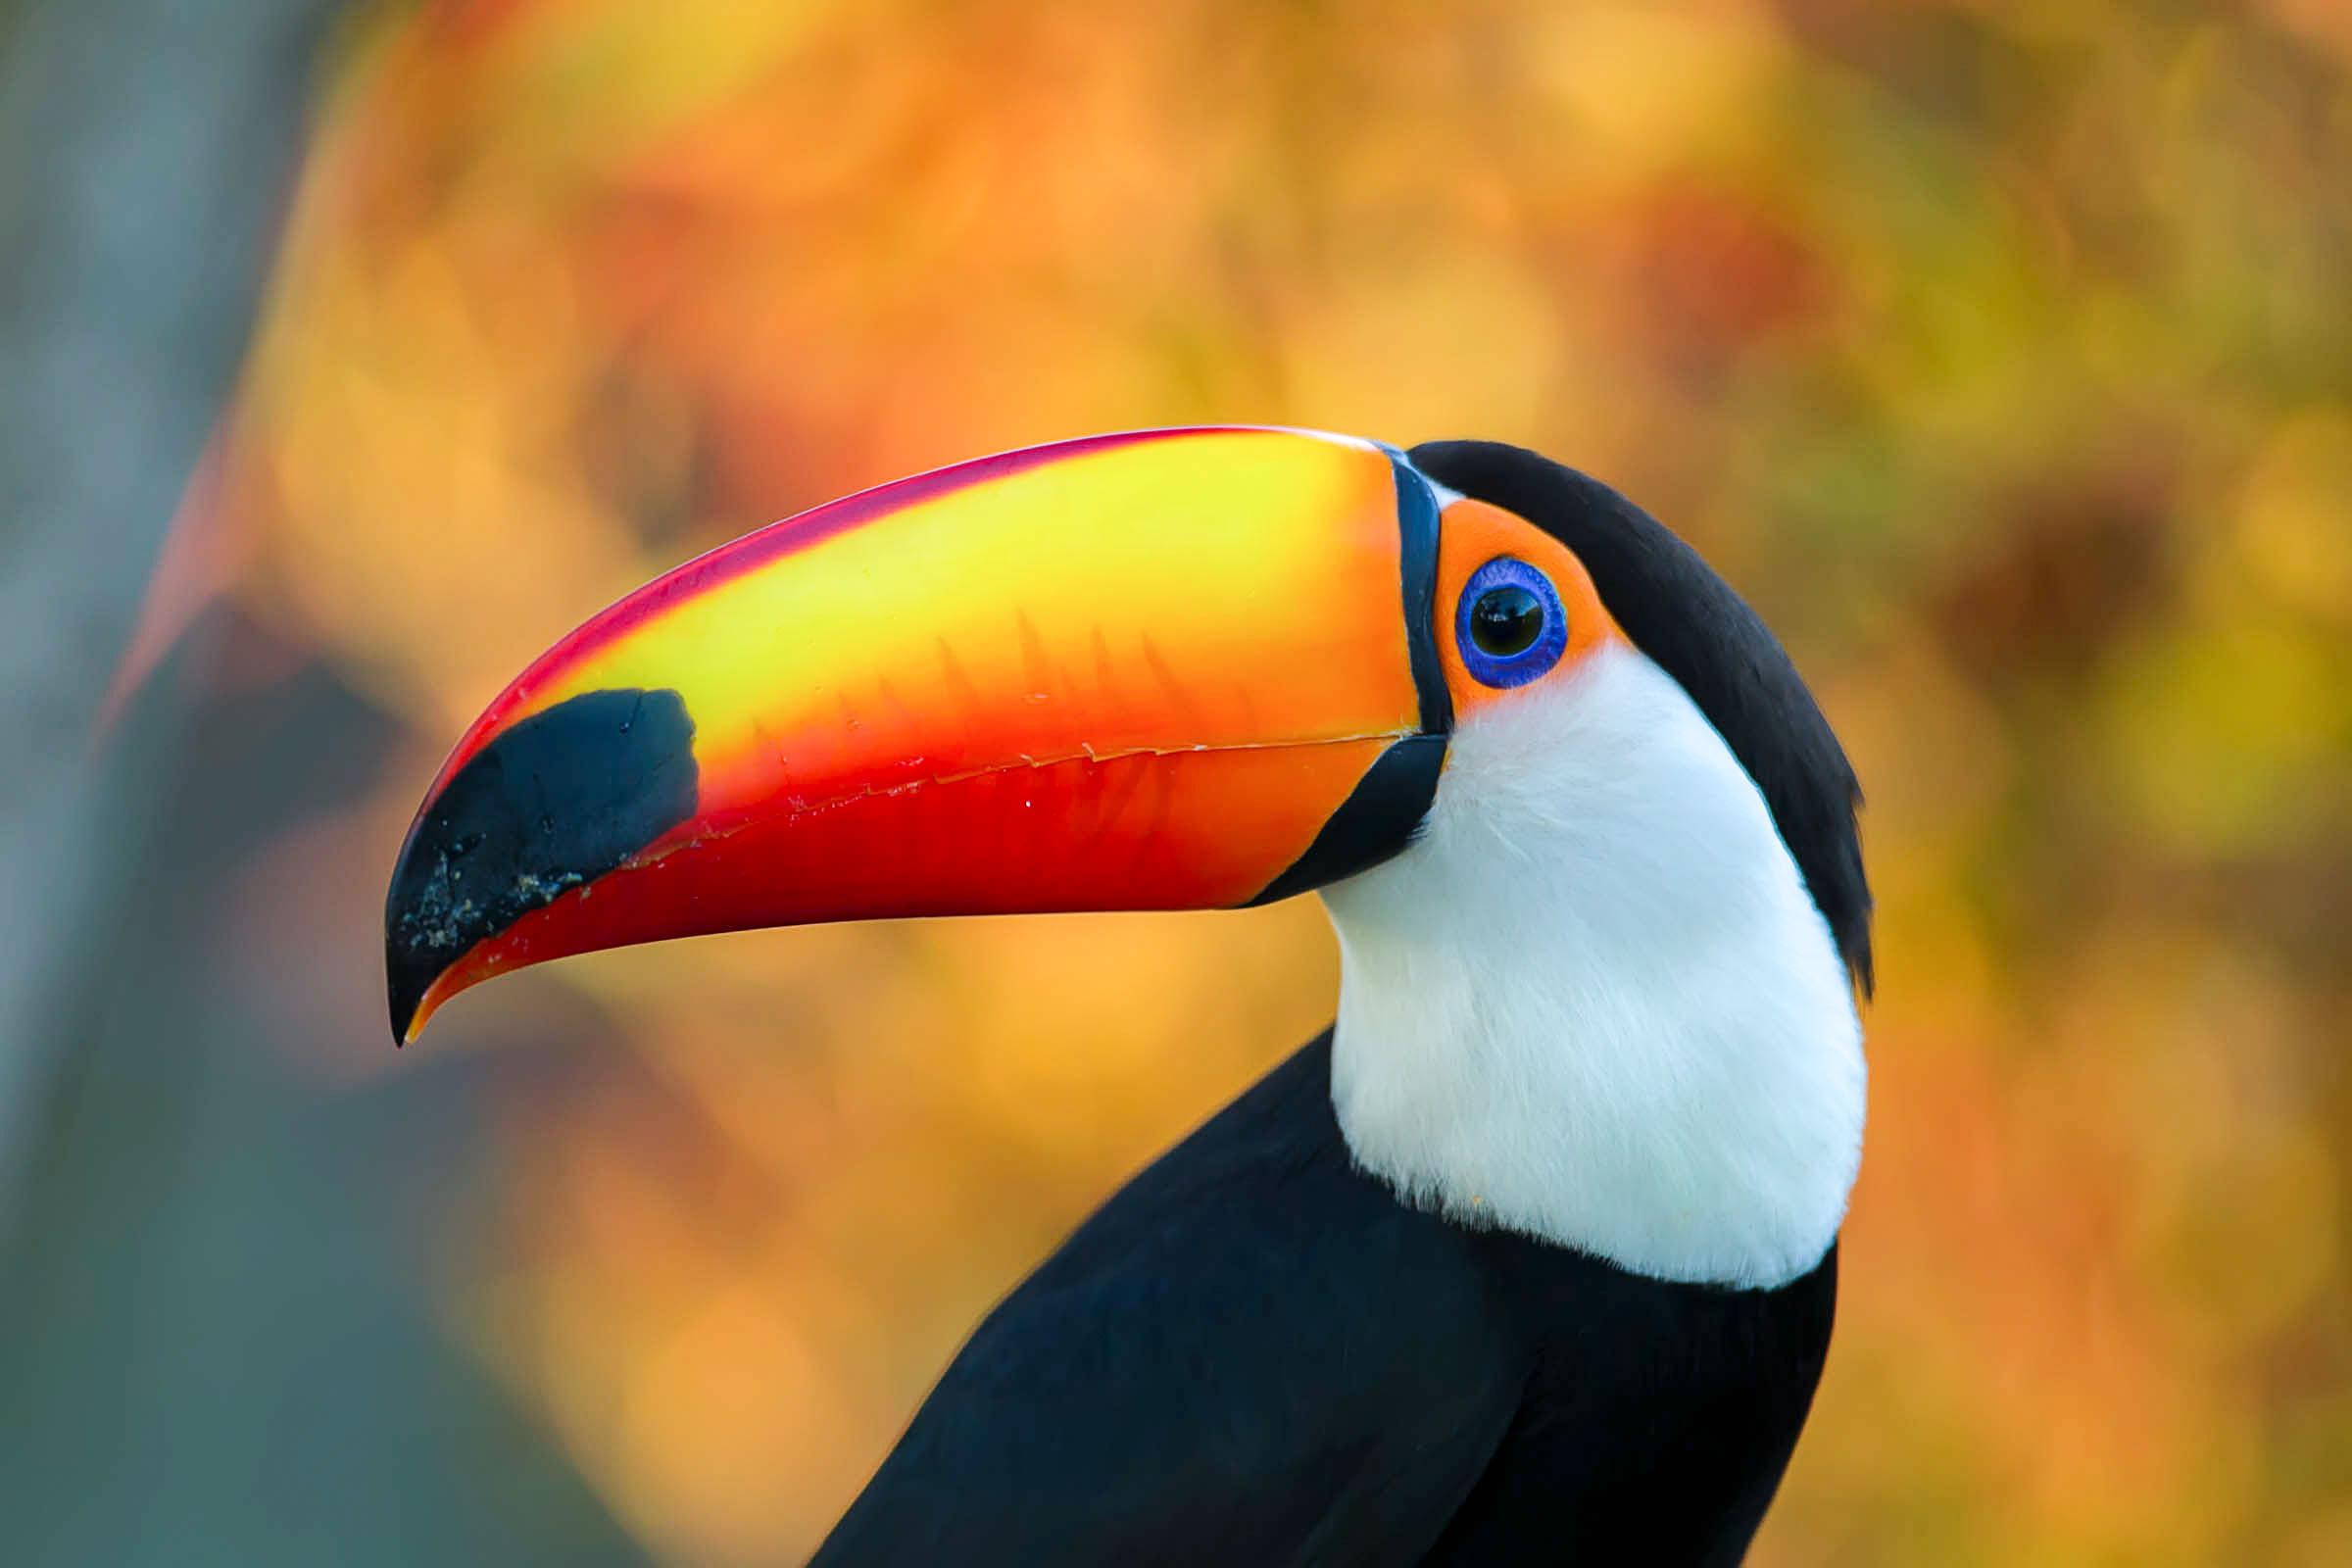 a1_4622_16_toco-toucan_peter_cavanagh_kk.jpg